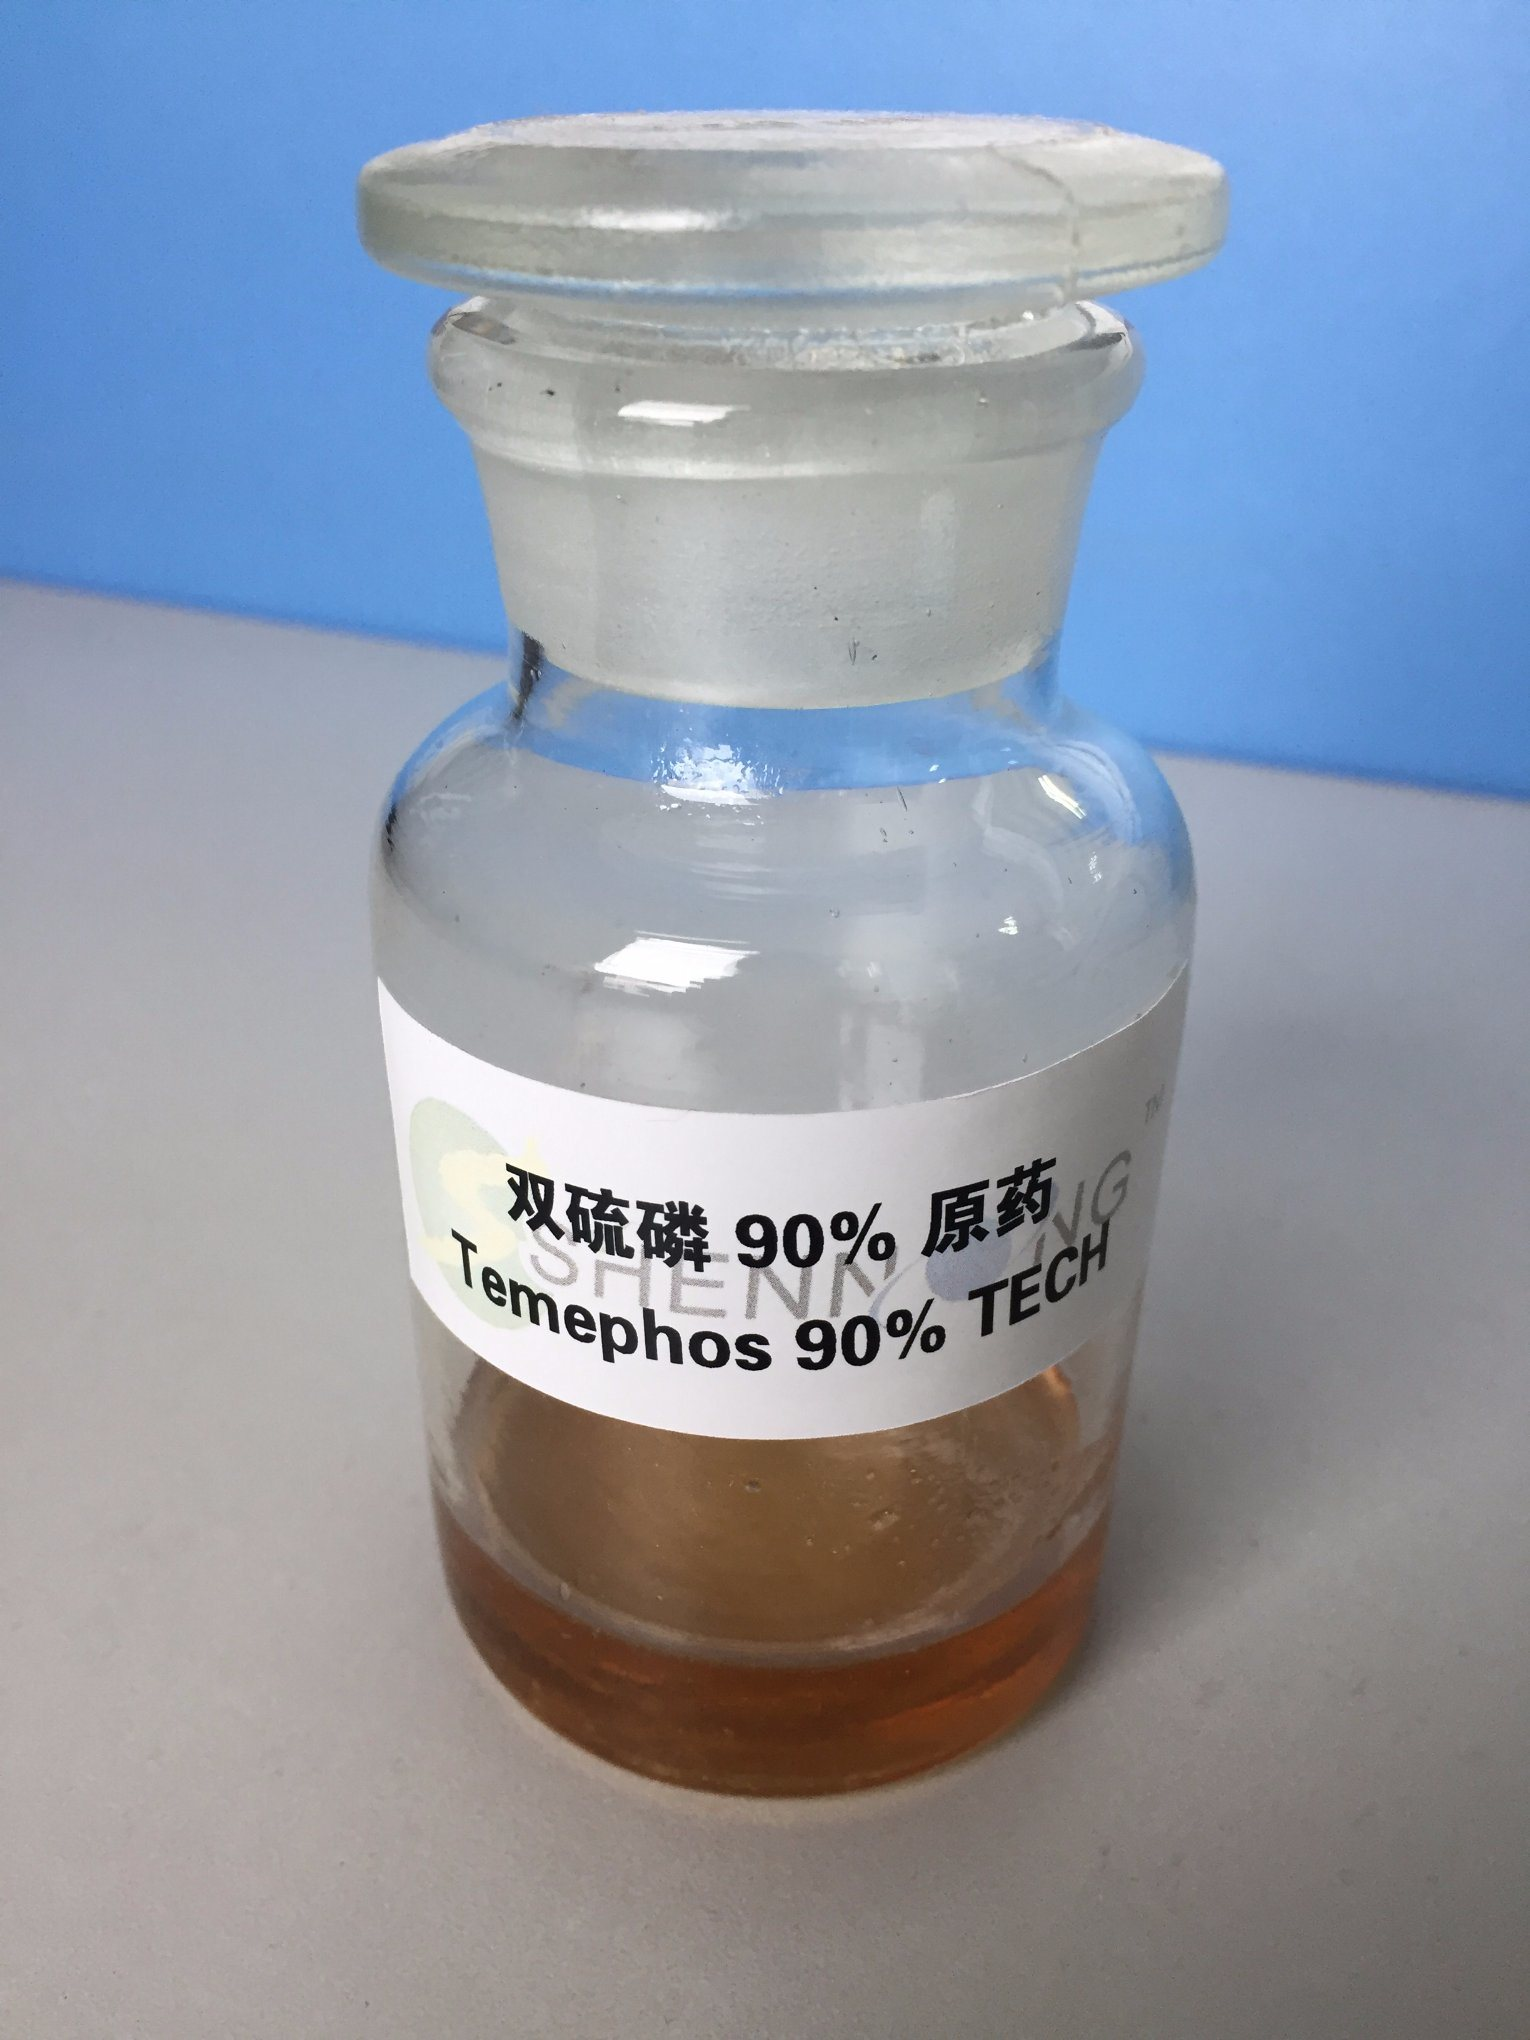 Temephos 90% Tech (High Efficient Bactericide)